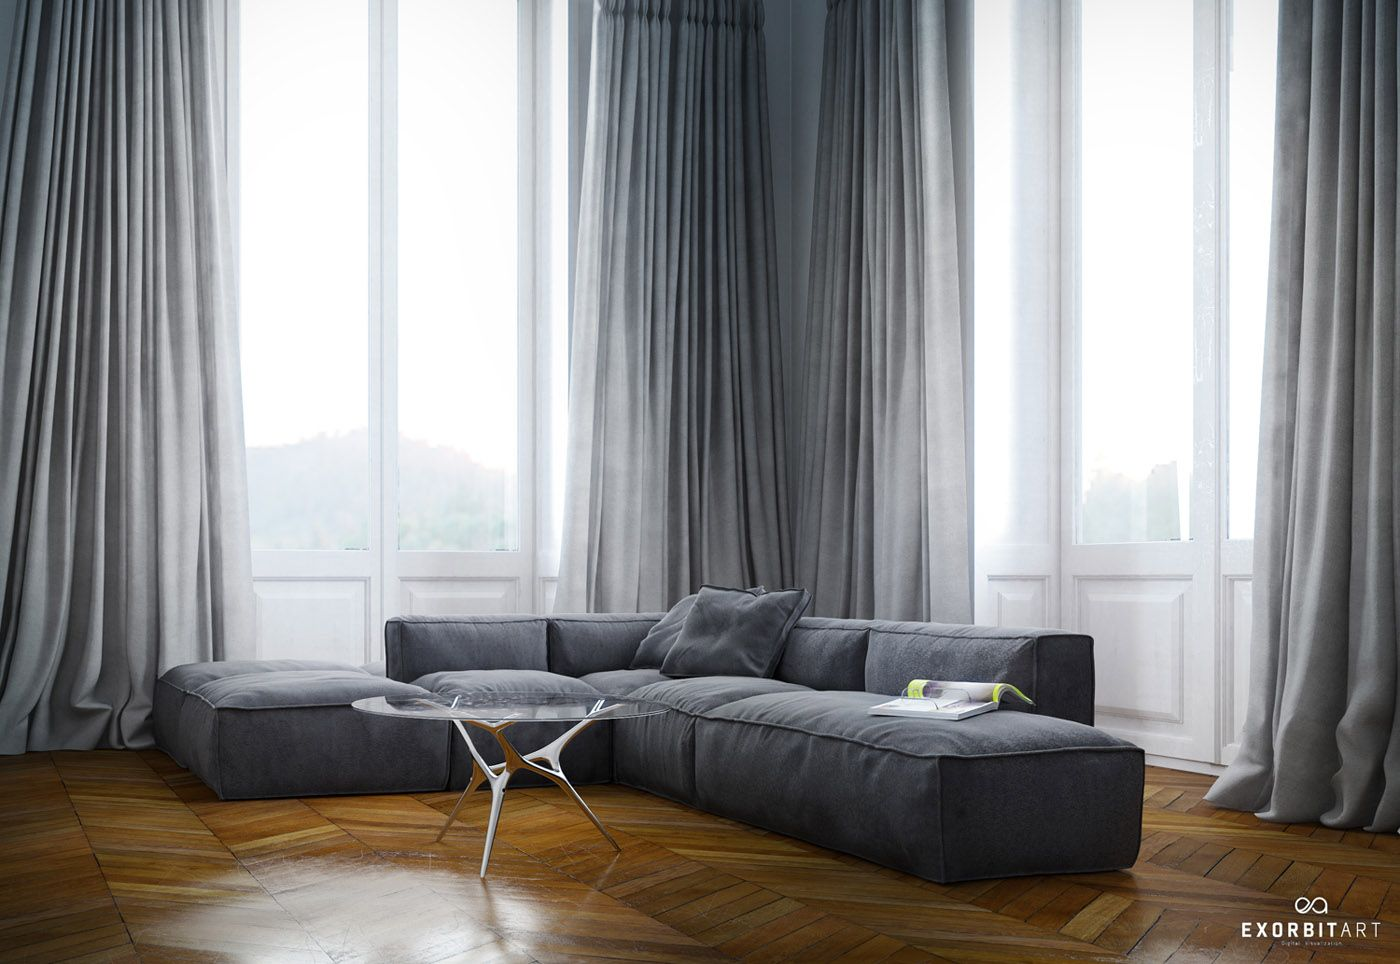 altbauwohnung-bonaldo-sofa-1.JPG (1400×964)